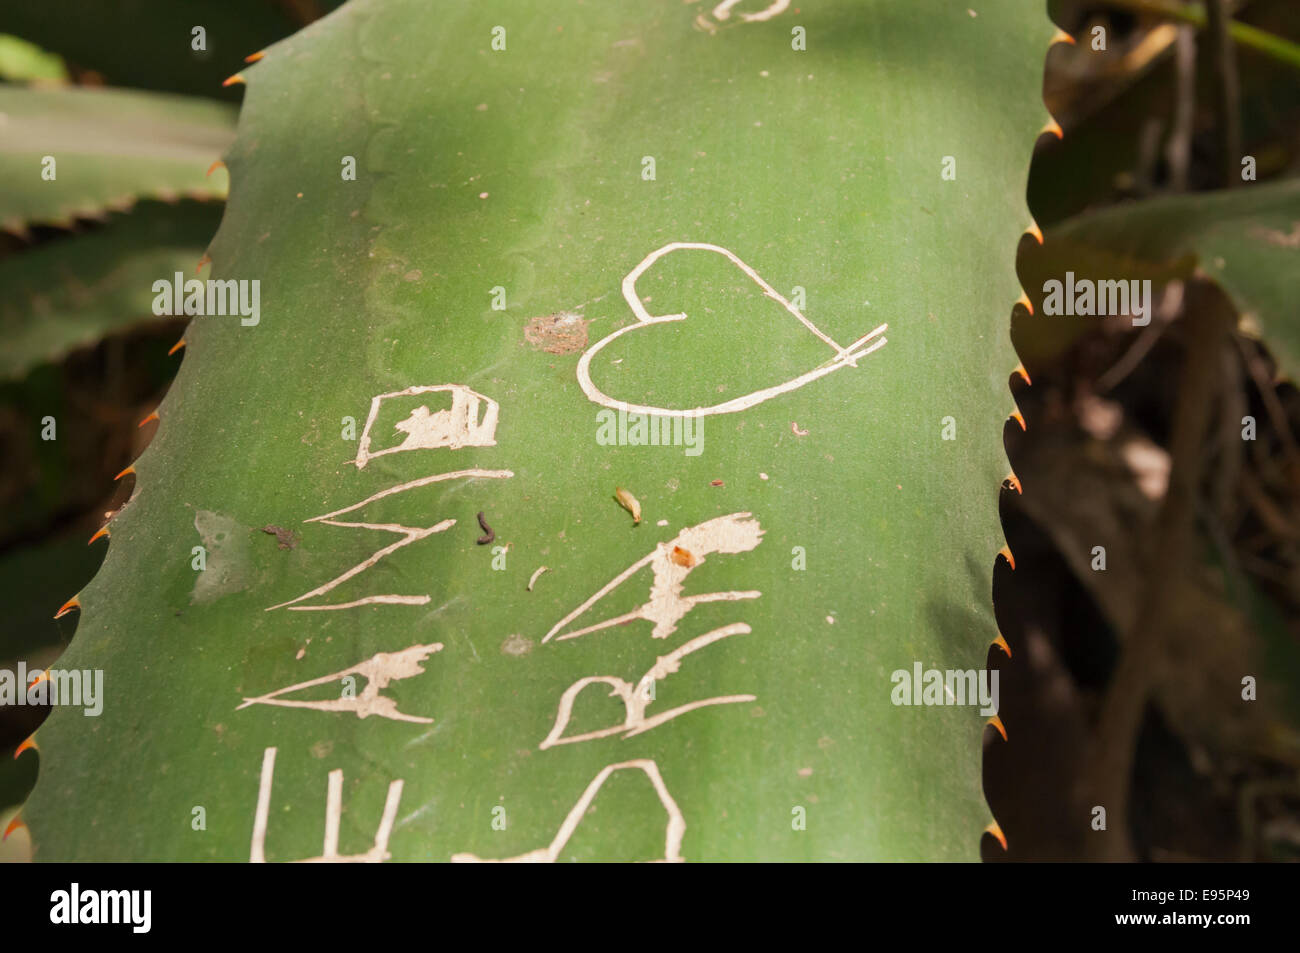 Names and words carved into a plant leaf graffiti vandalism panajachel guatemala